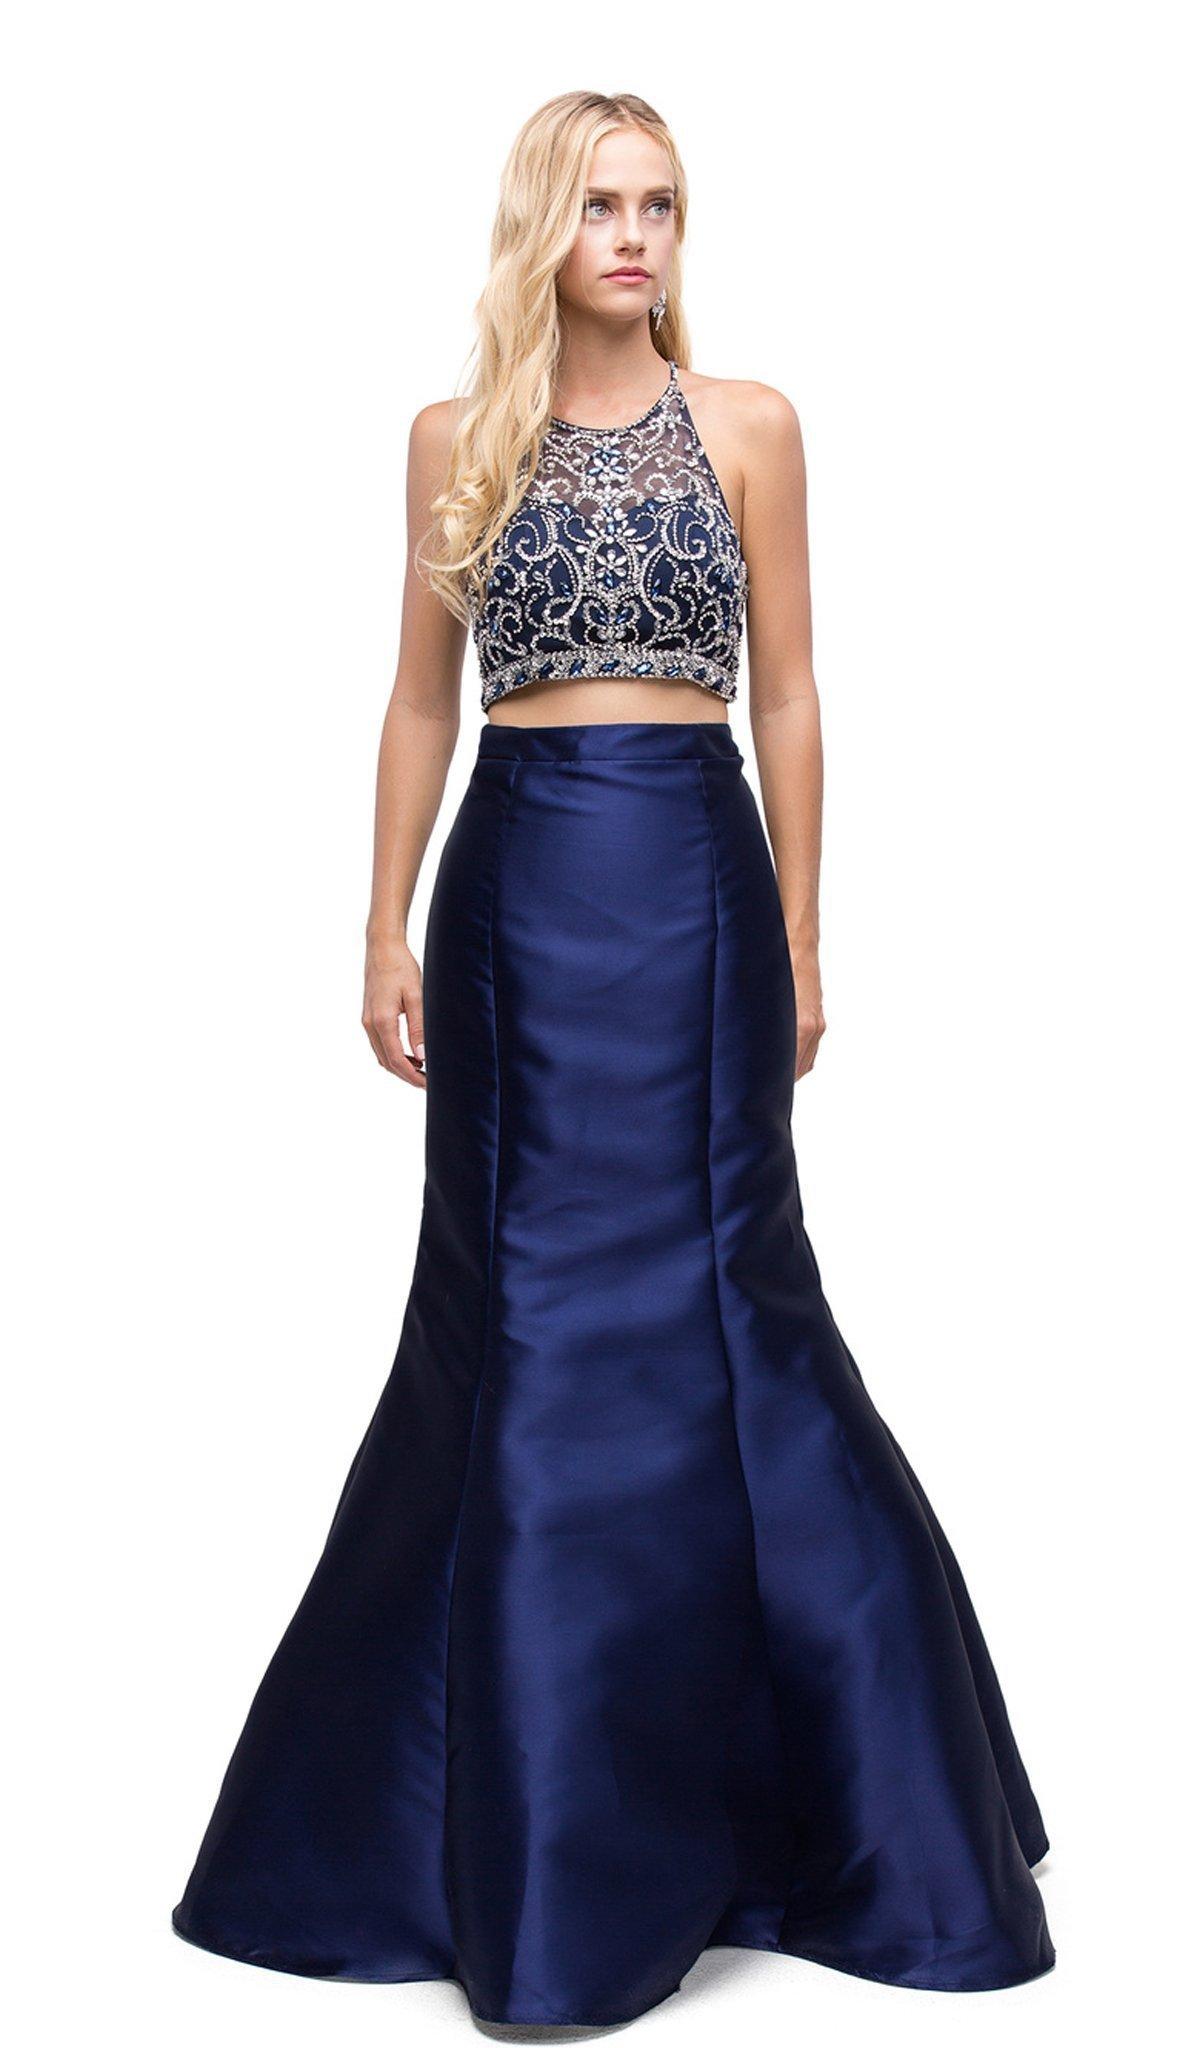 Dancing Queen - 9831 Embellished Two Piece Mermaid Evening Dress